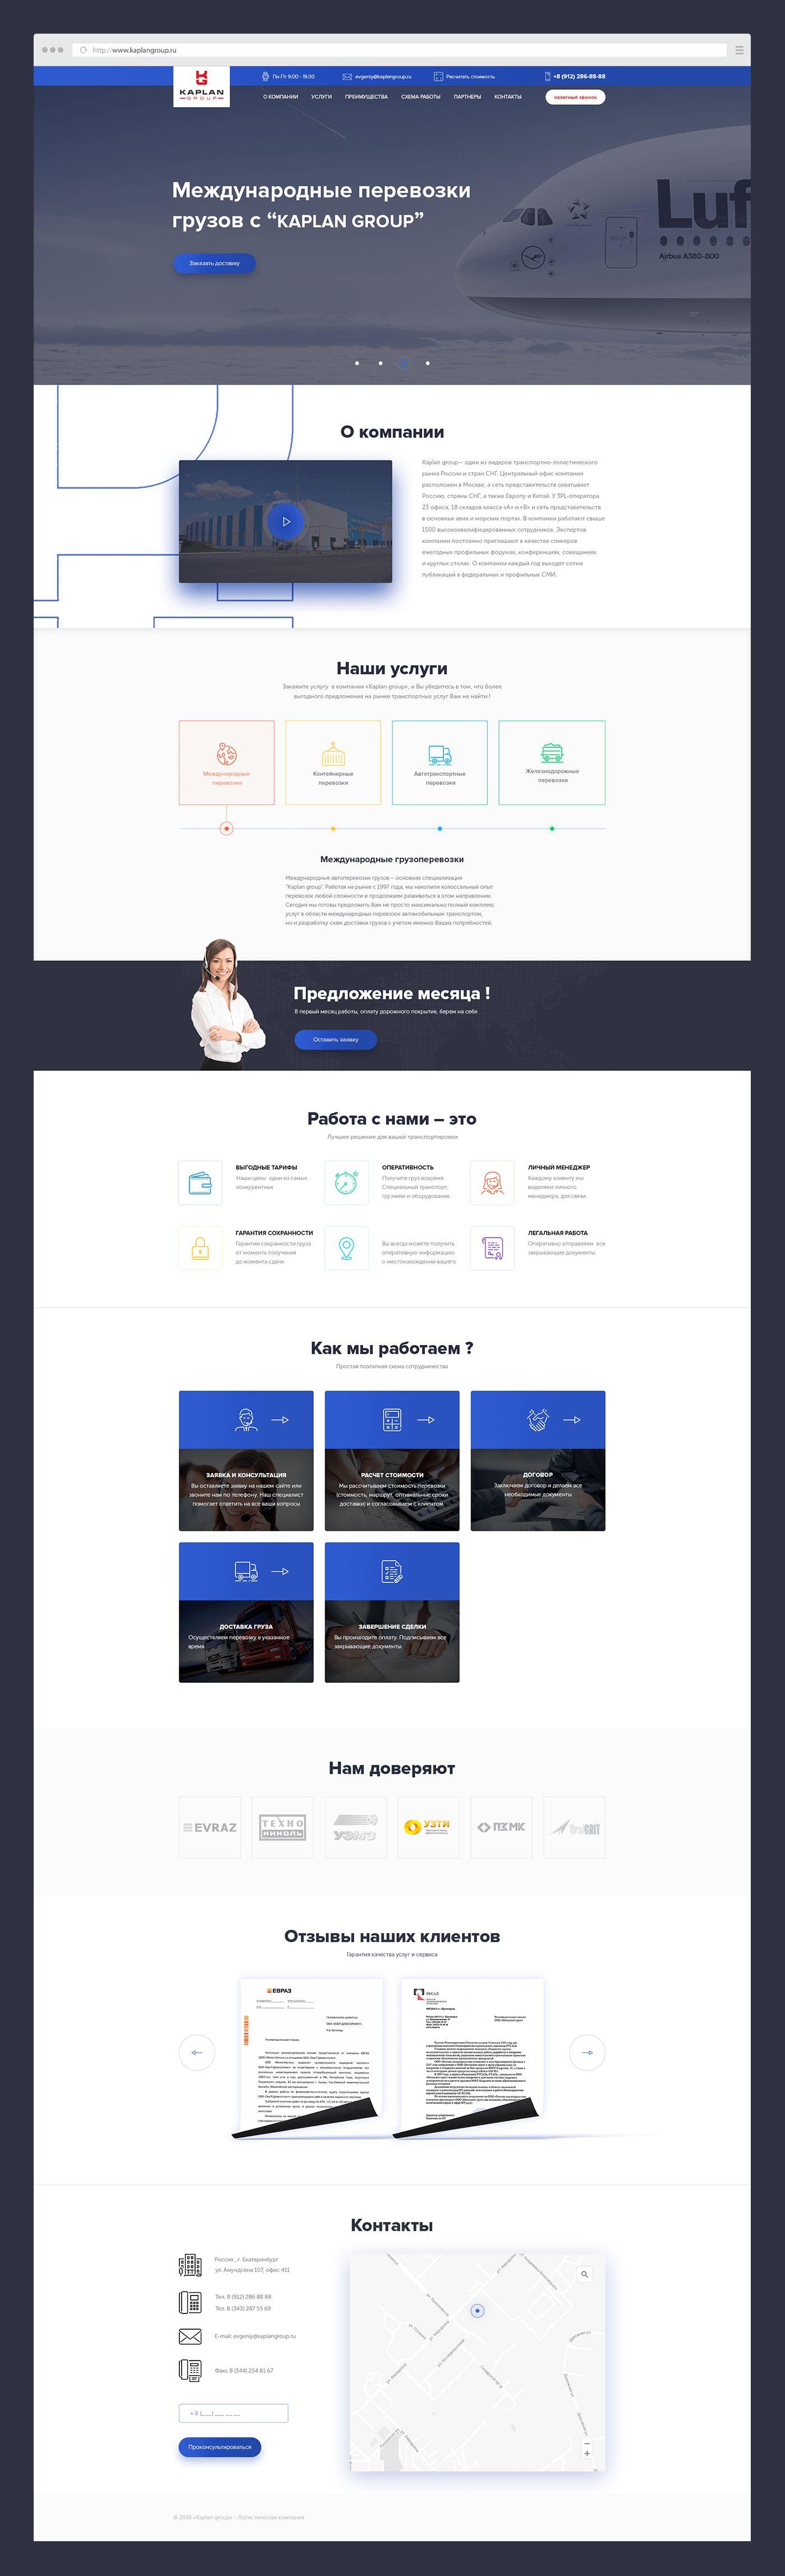 Landing page для kaplangroup.ru - дизайнер Andrew8792